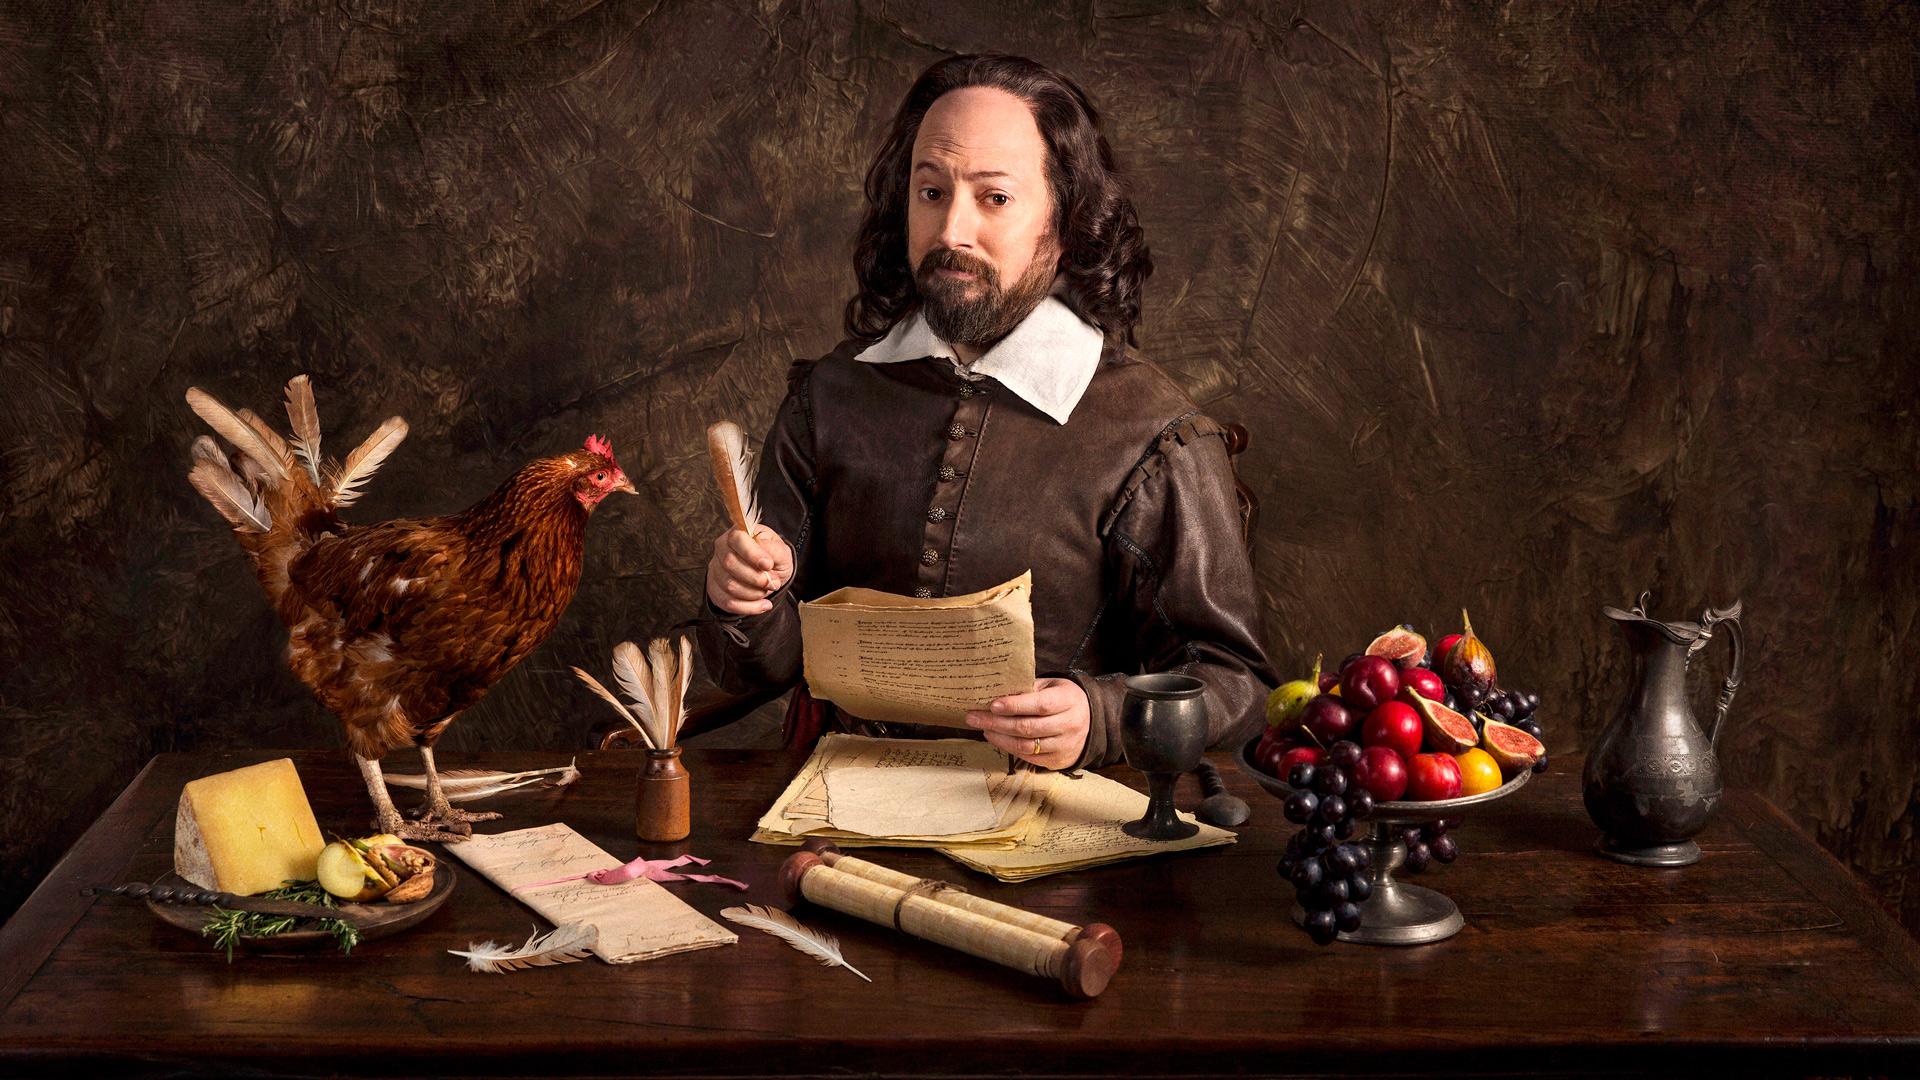 Баннер к сериалу «Уильям наш, Шекспир» (2016 — 2018)